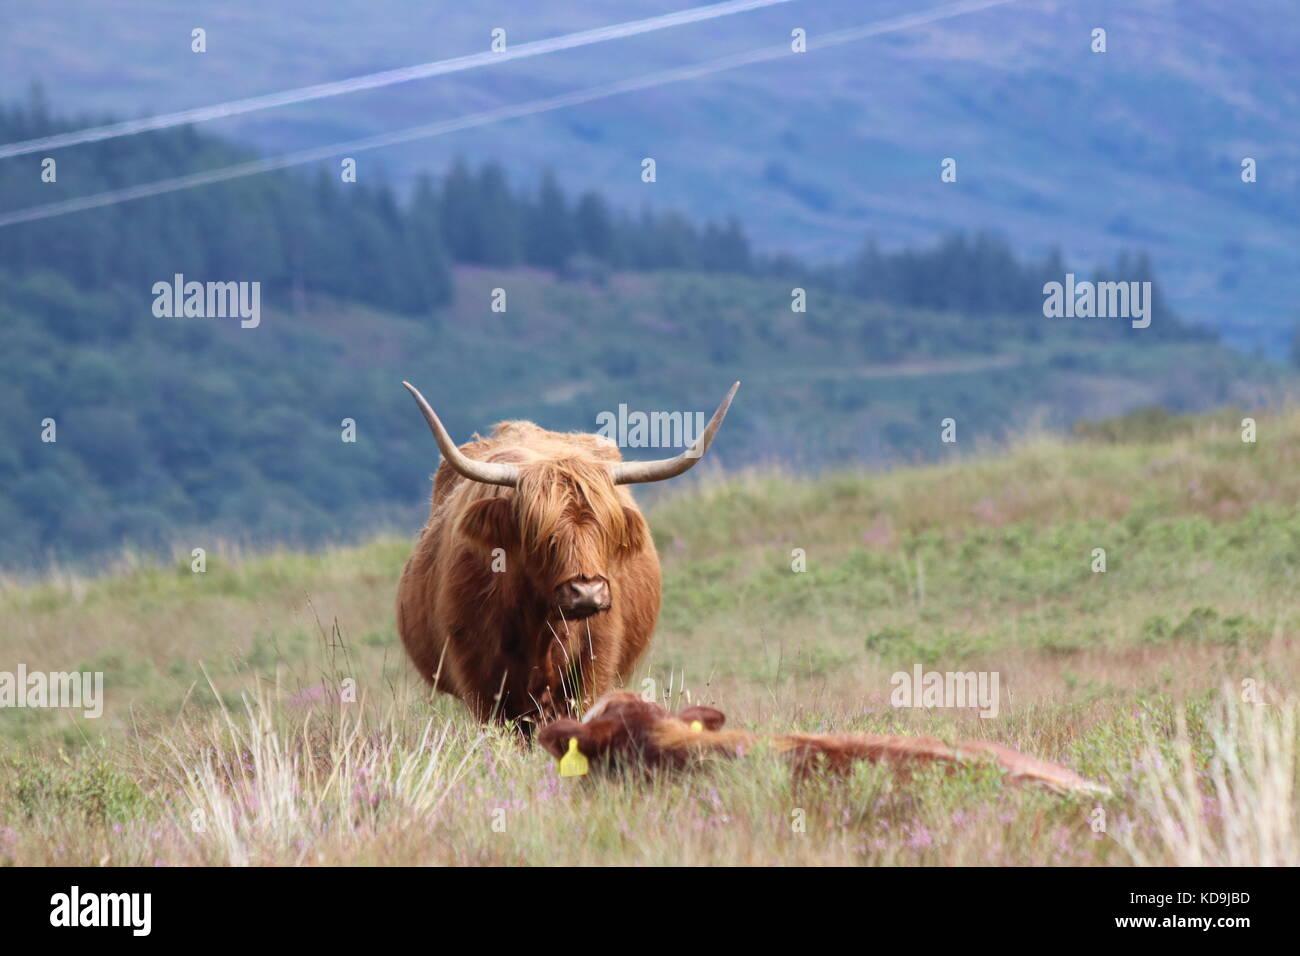 Highland cattle in Scotland, Highlands - Stock Image